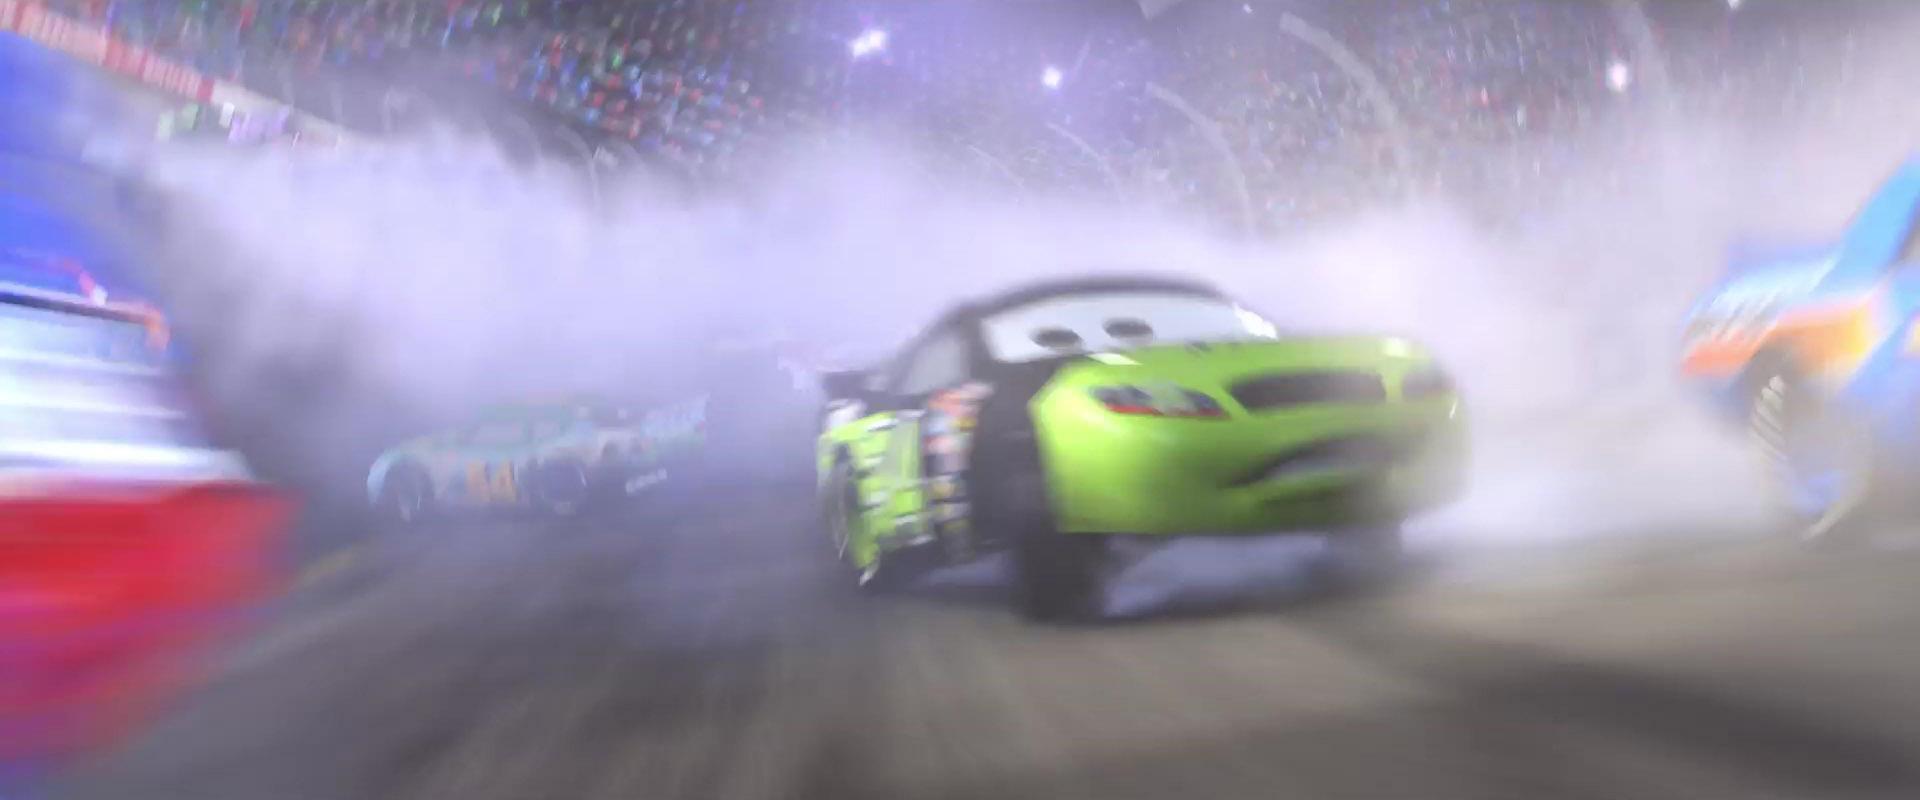 dirkson dagostino personnage character pixar disney cars